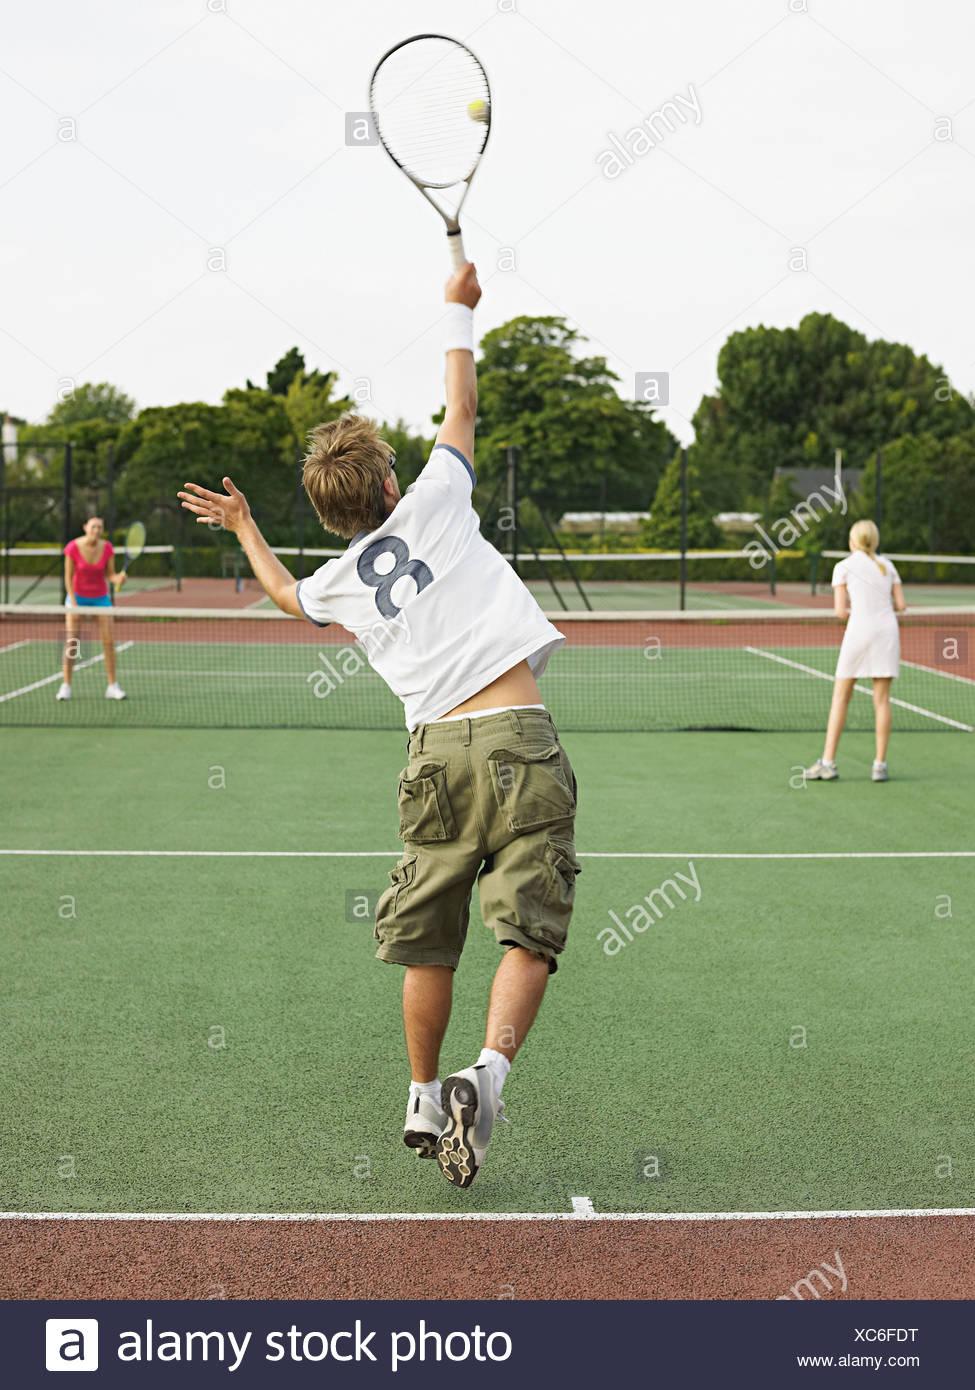 People playing tennis Stock Photo